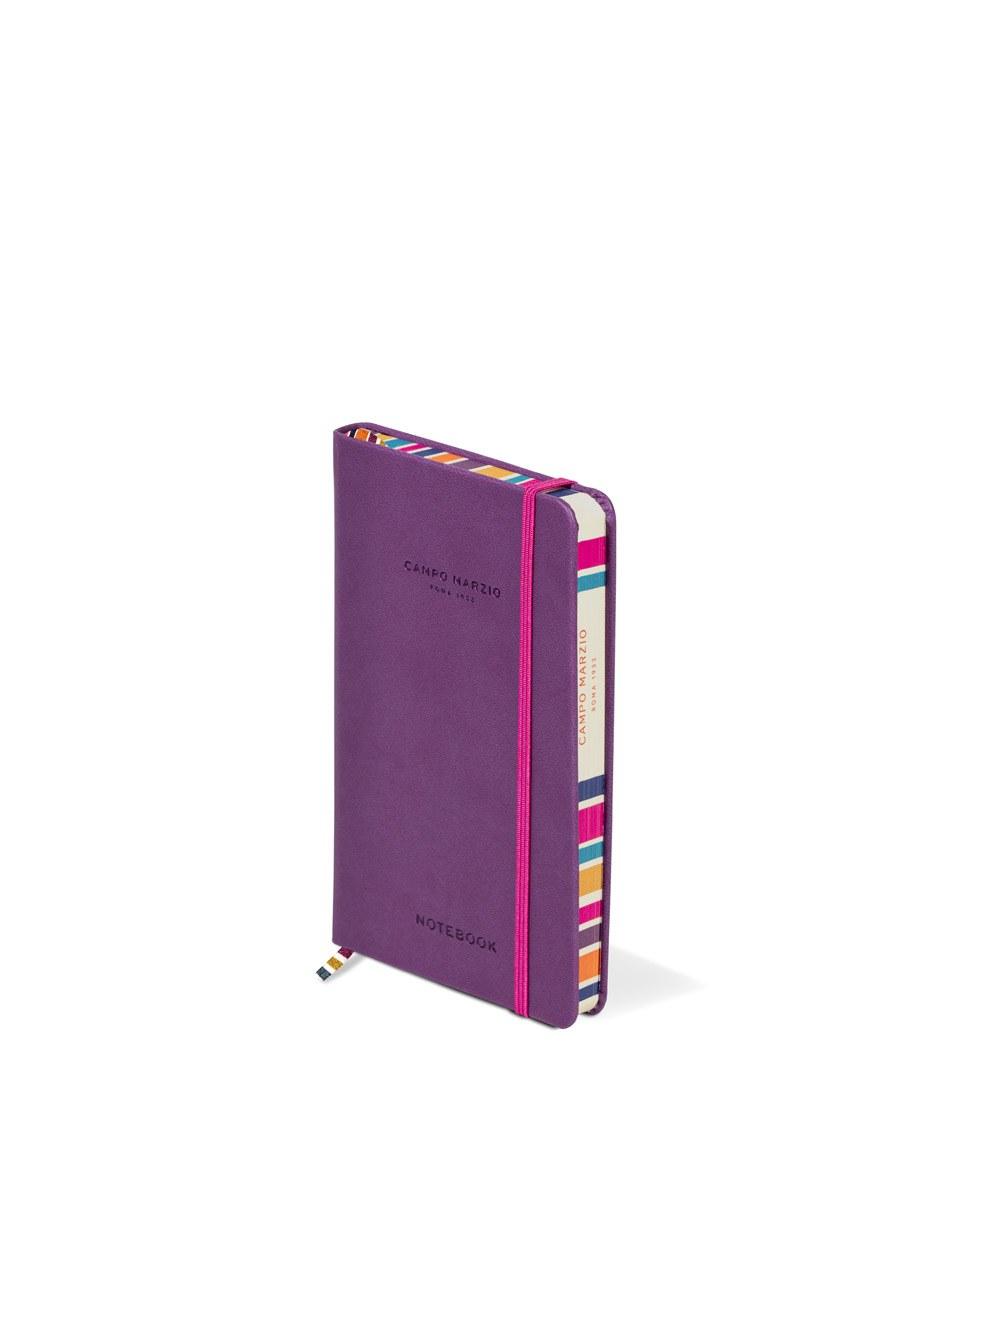 Notes 9x14 Multicolor Edge - Violet